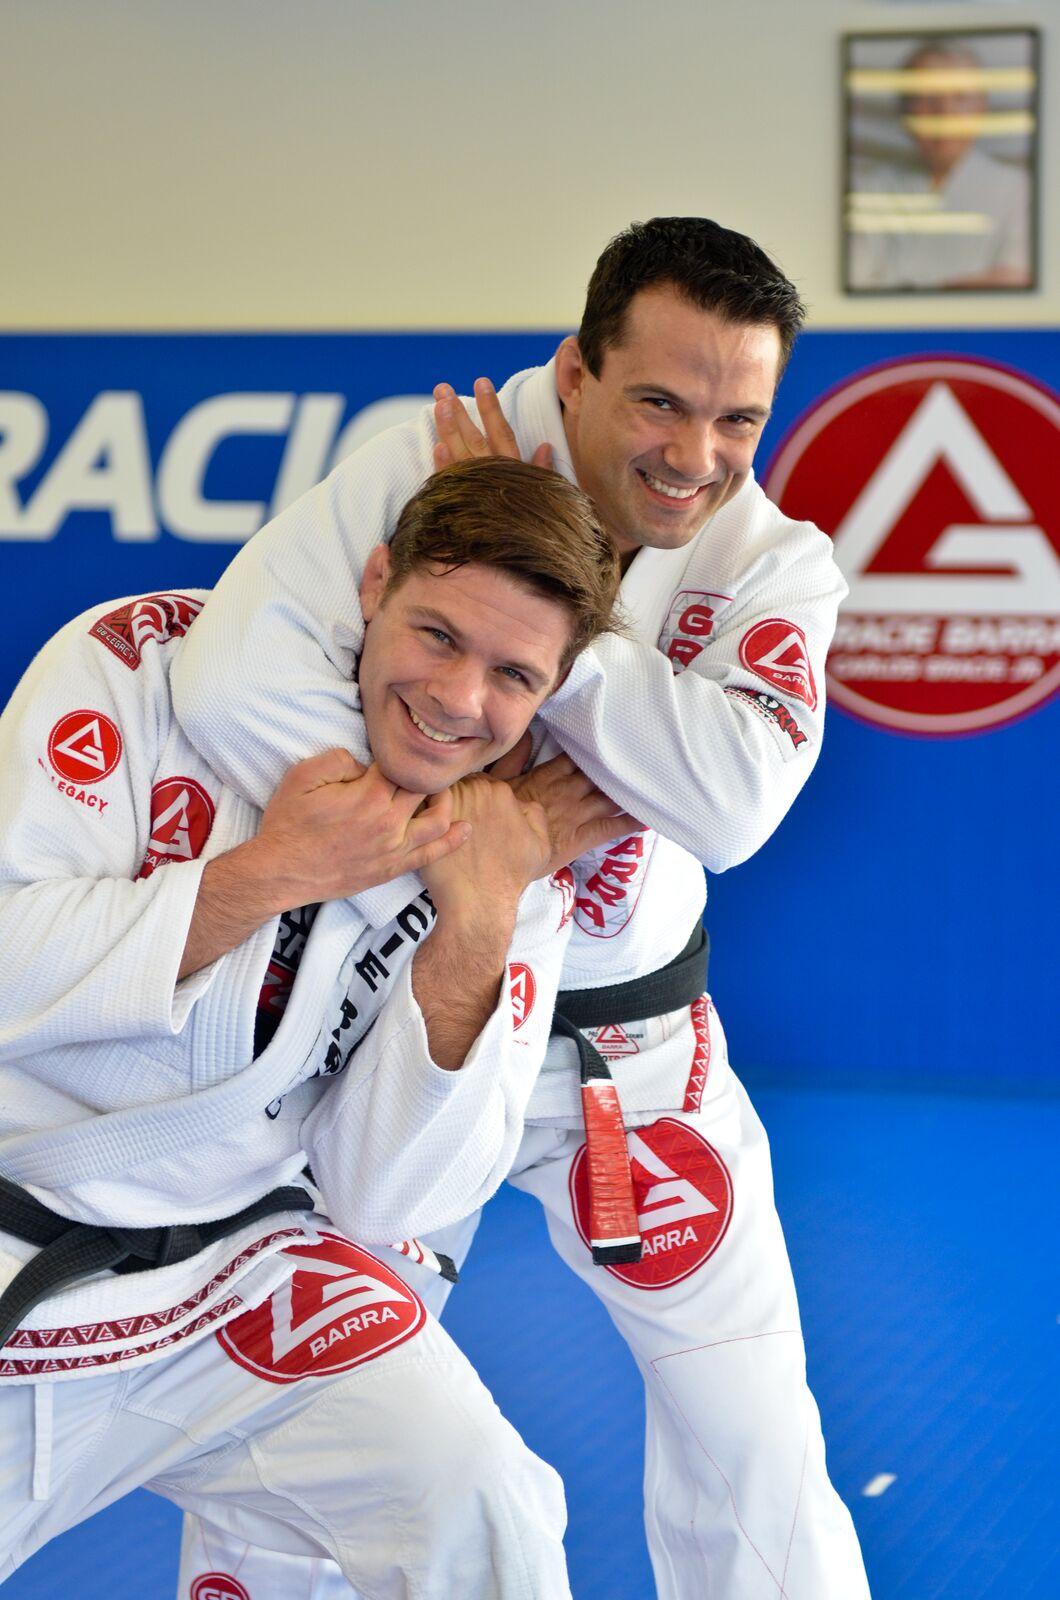 Gracie Barra Brazilian Jiu-Jitsu & Self Defense